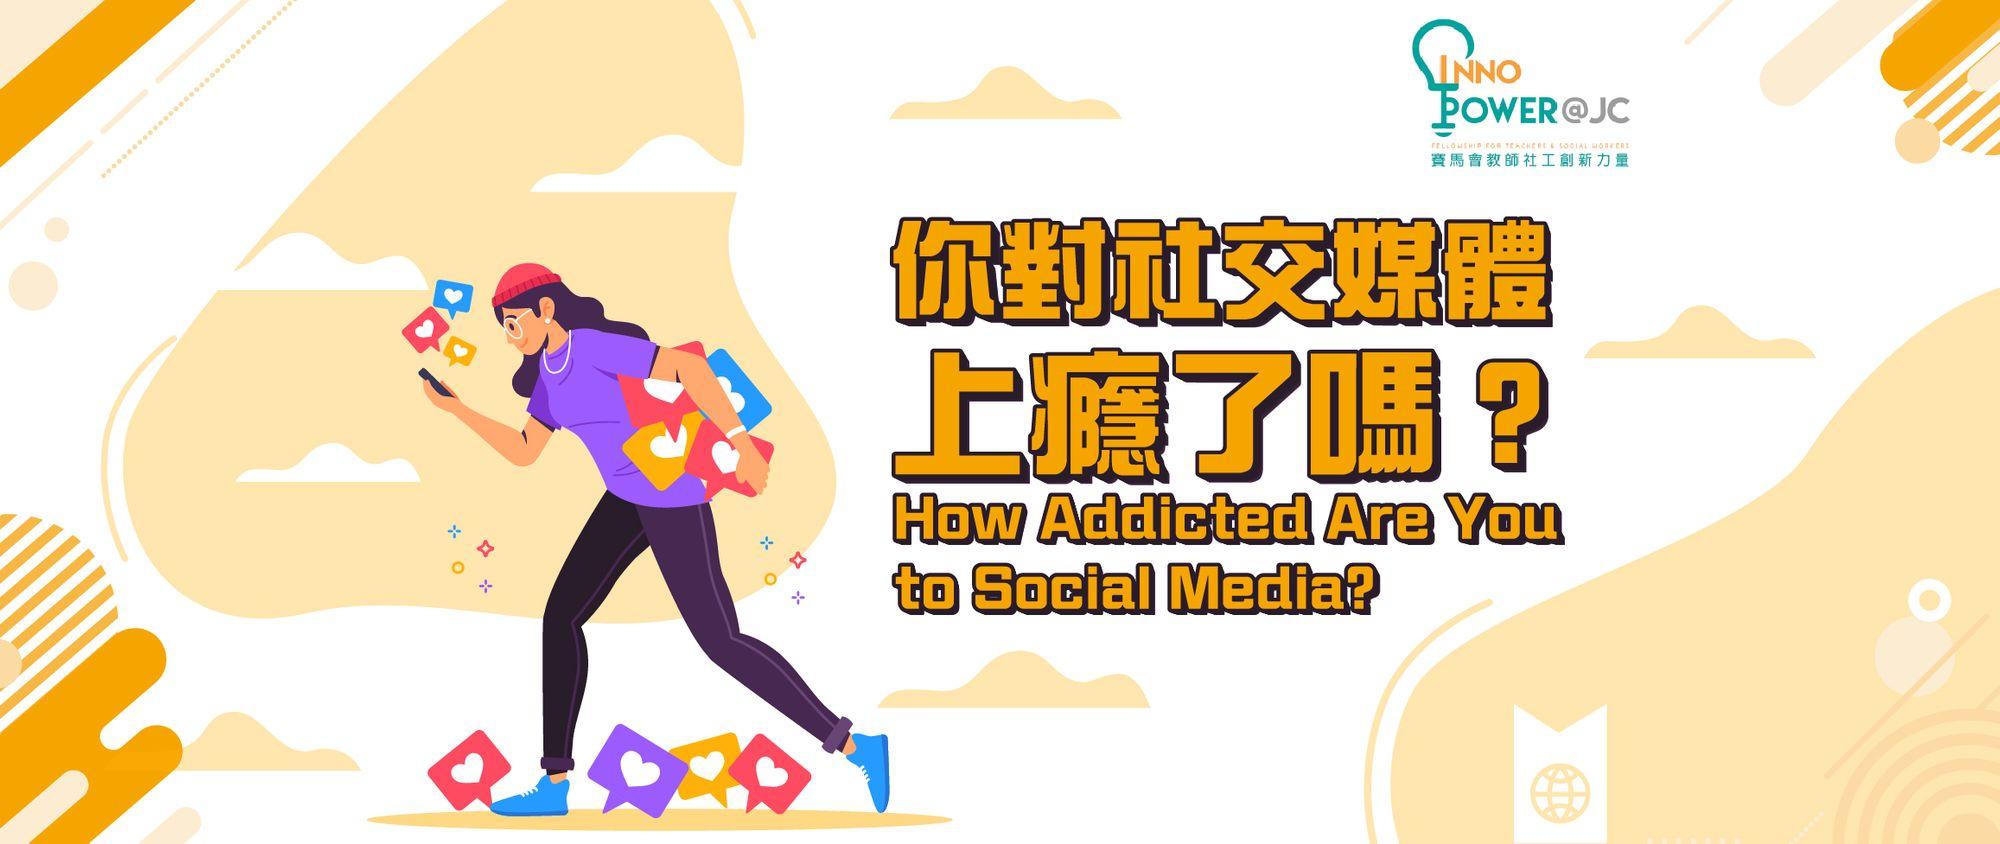 socialemotional2